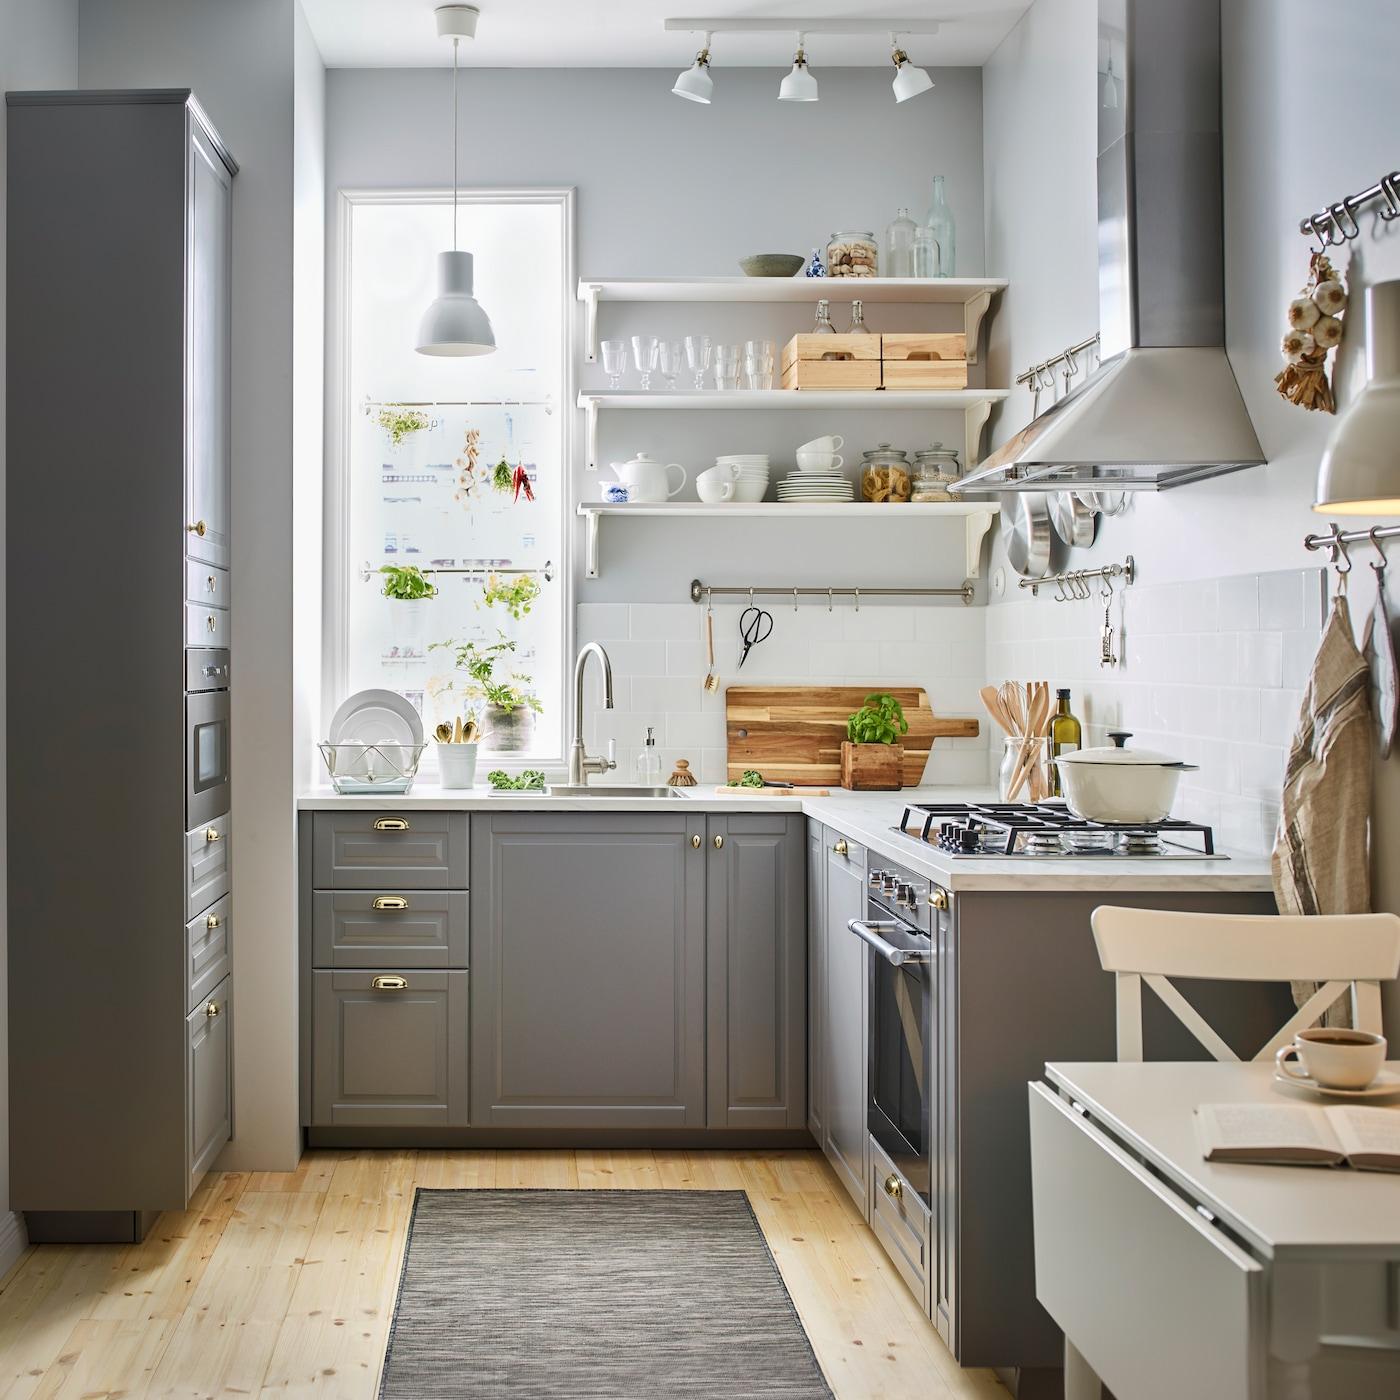 Design Classique Pour Petite Cuisine